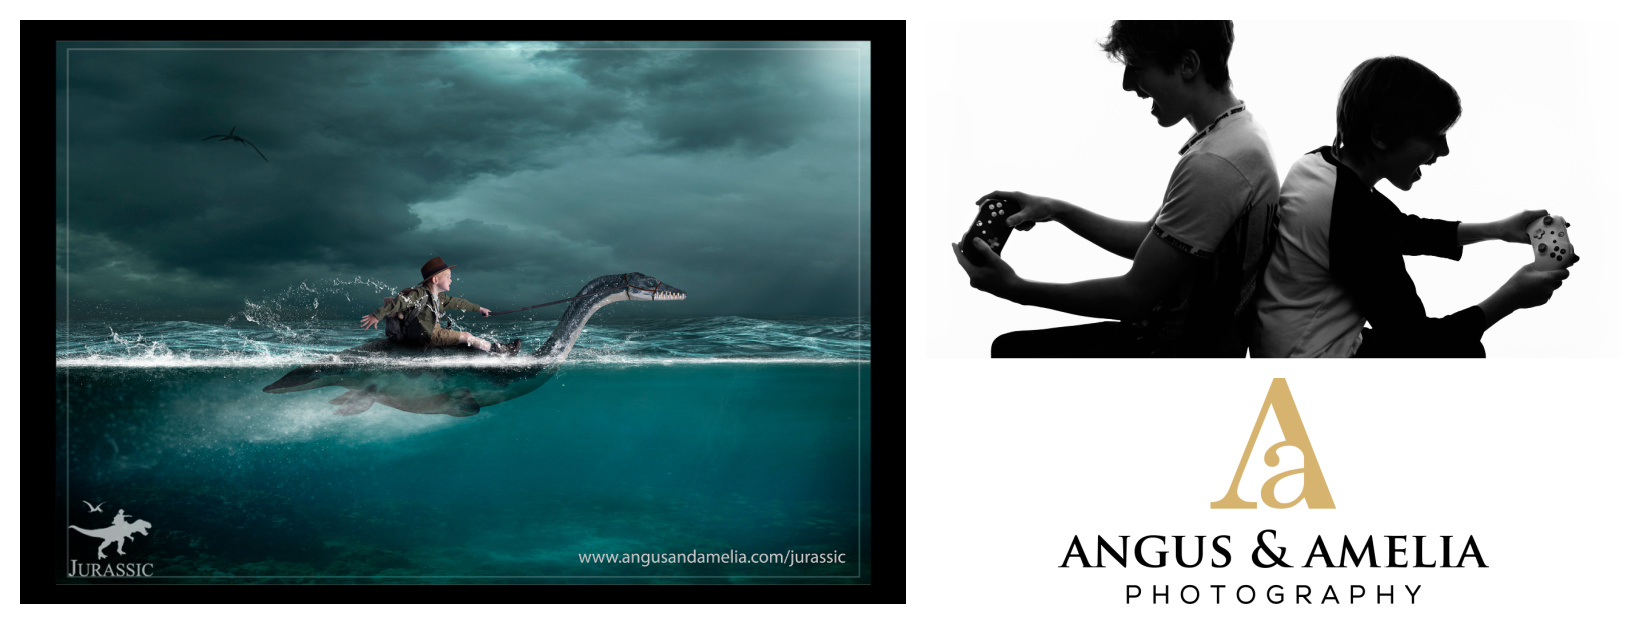 Angus & Amelia Photography